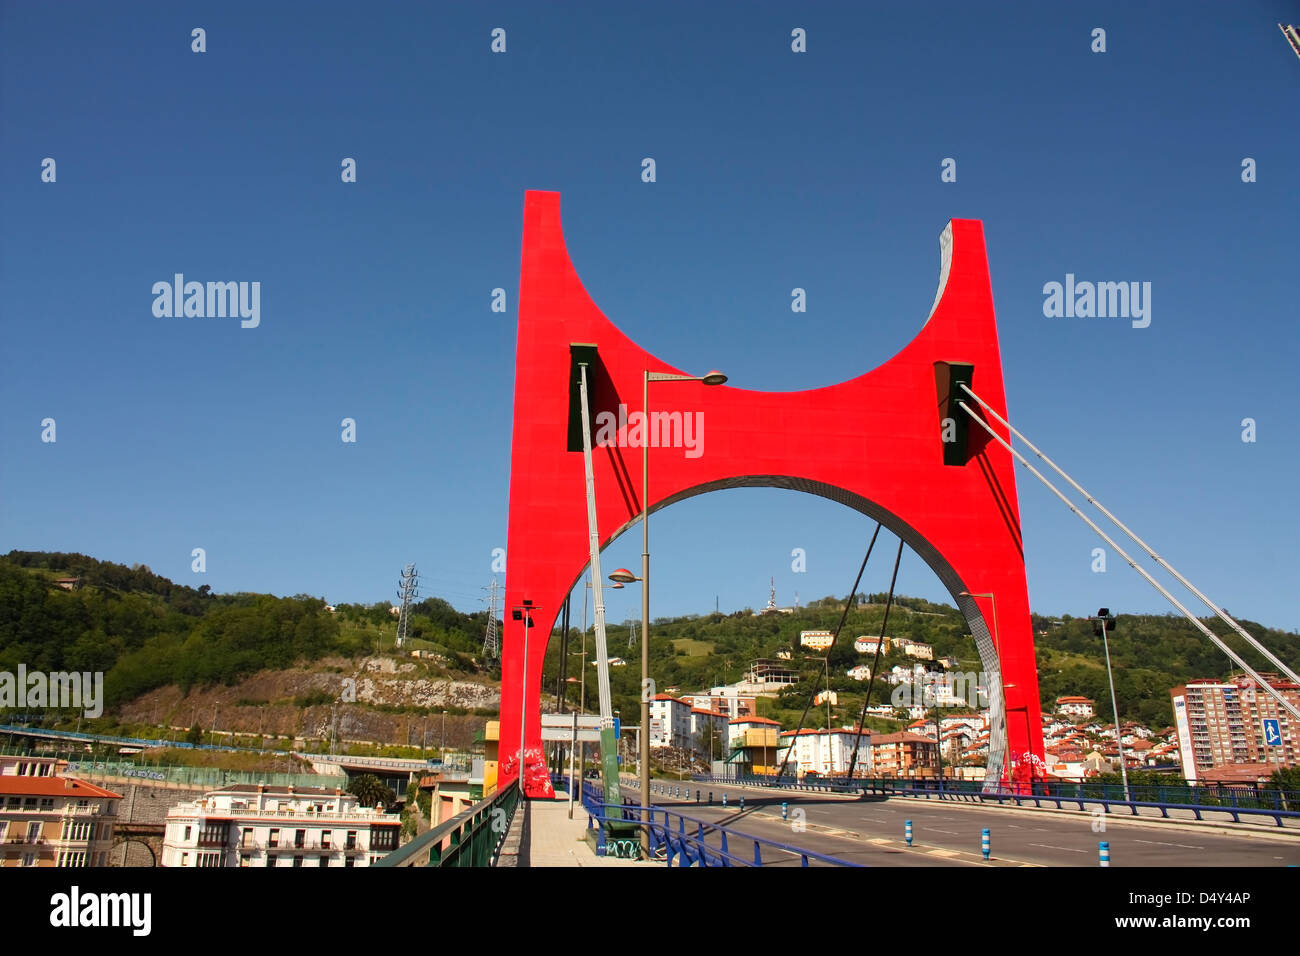 La Salve bridge, the gateway to the city of Bilbao Euskadi. - Stock Image